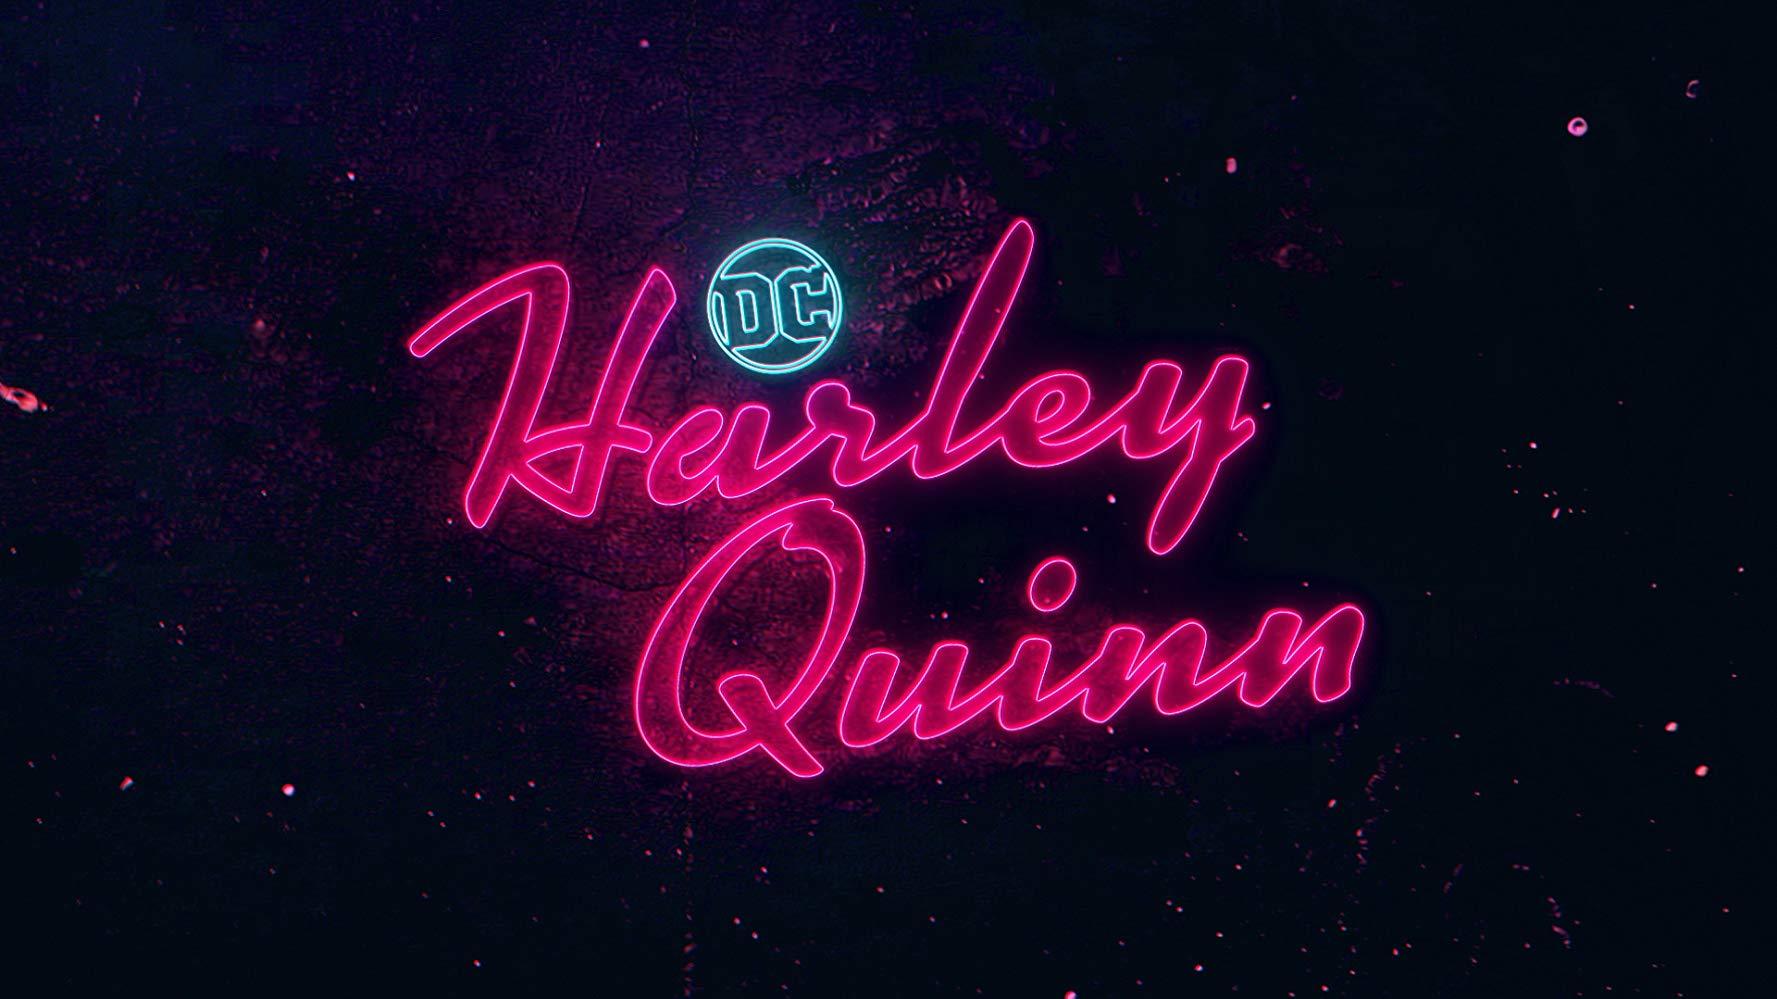 dc-universe-harley-quinn-animated-series-logo.jpg